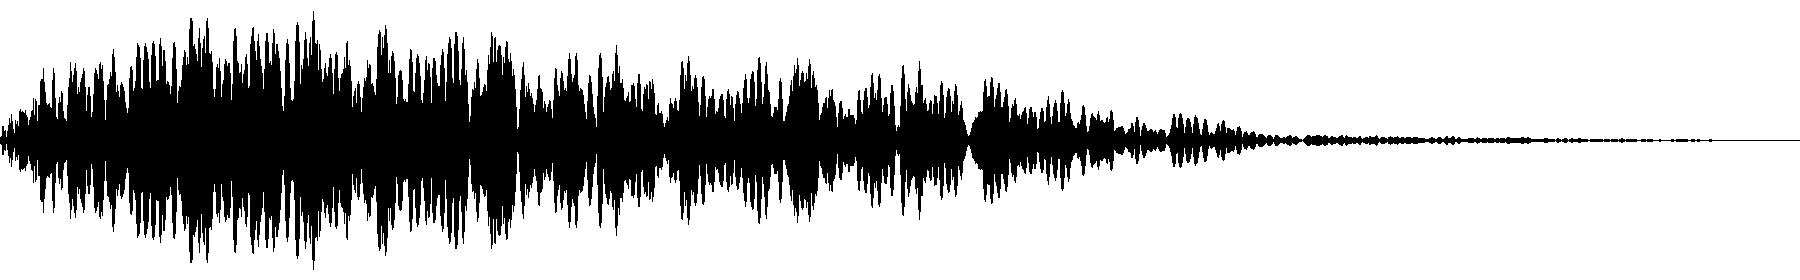 vedh synth cut 014 am9